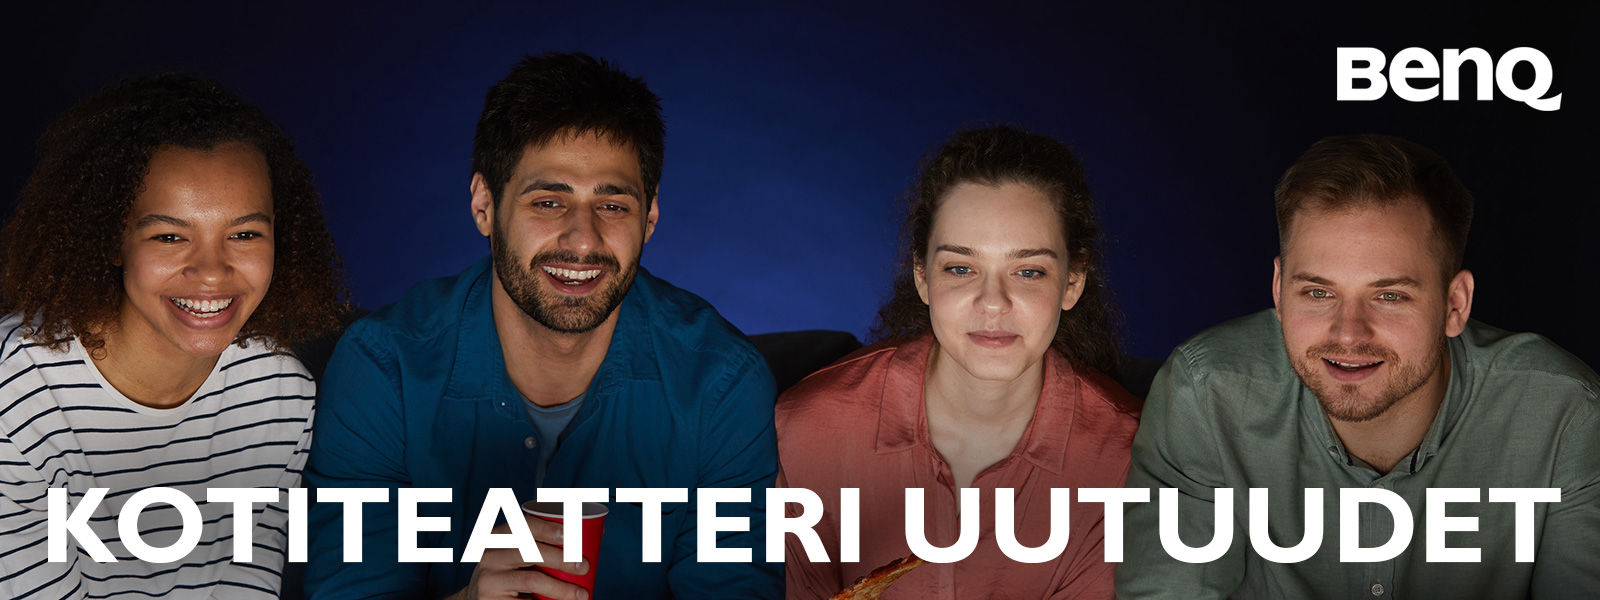 benq_kotiteatteri_header